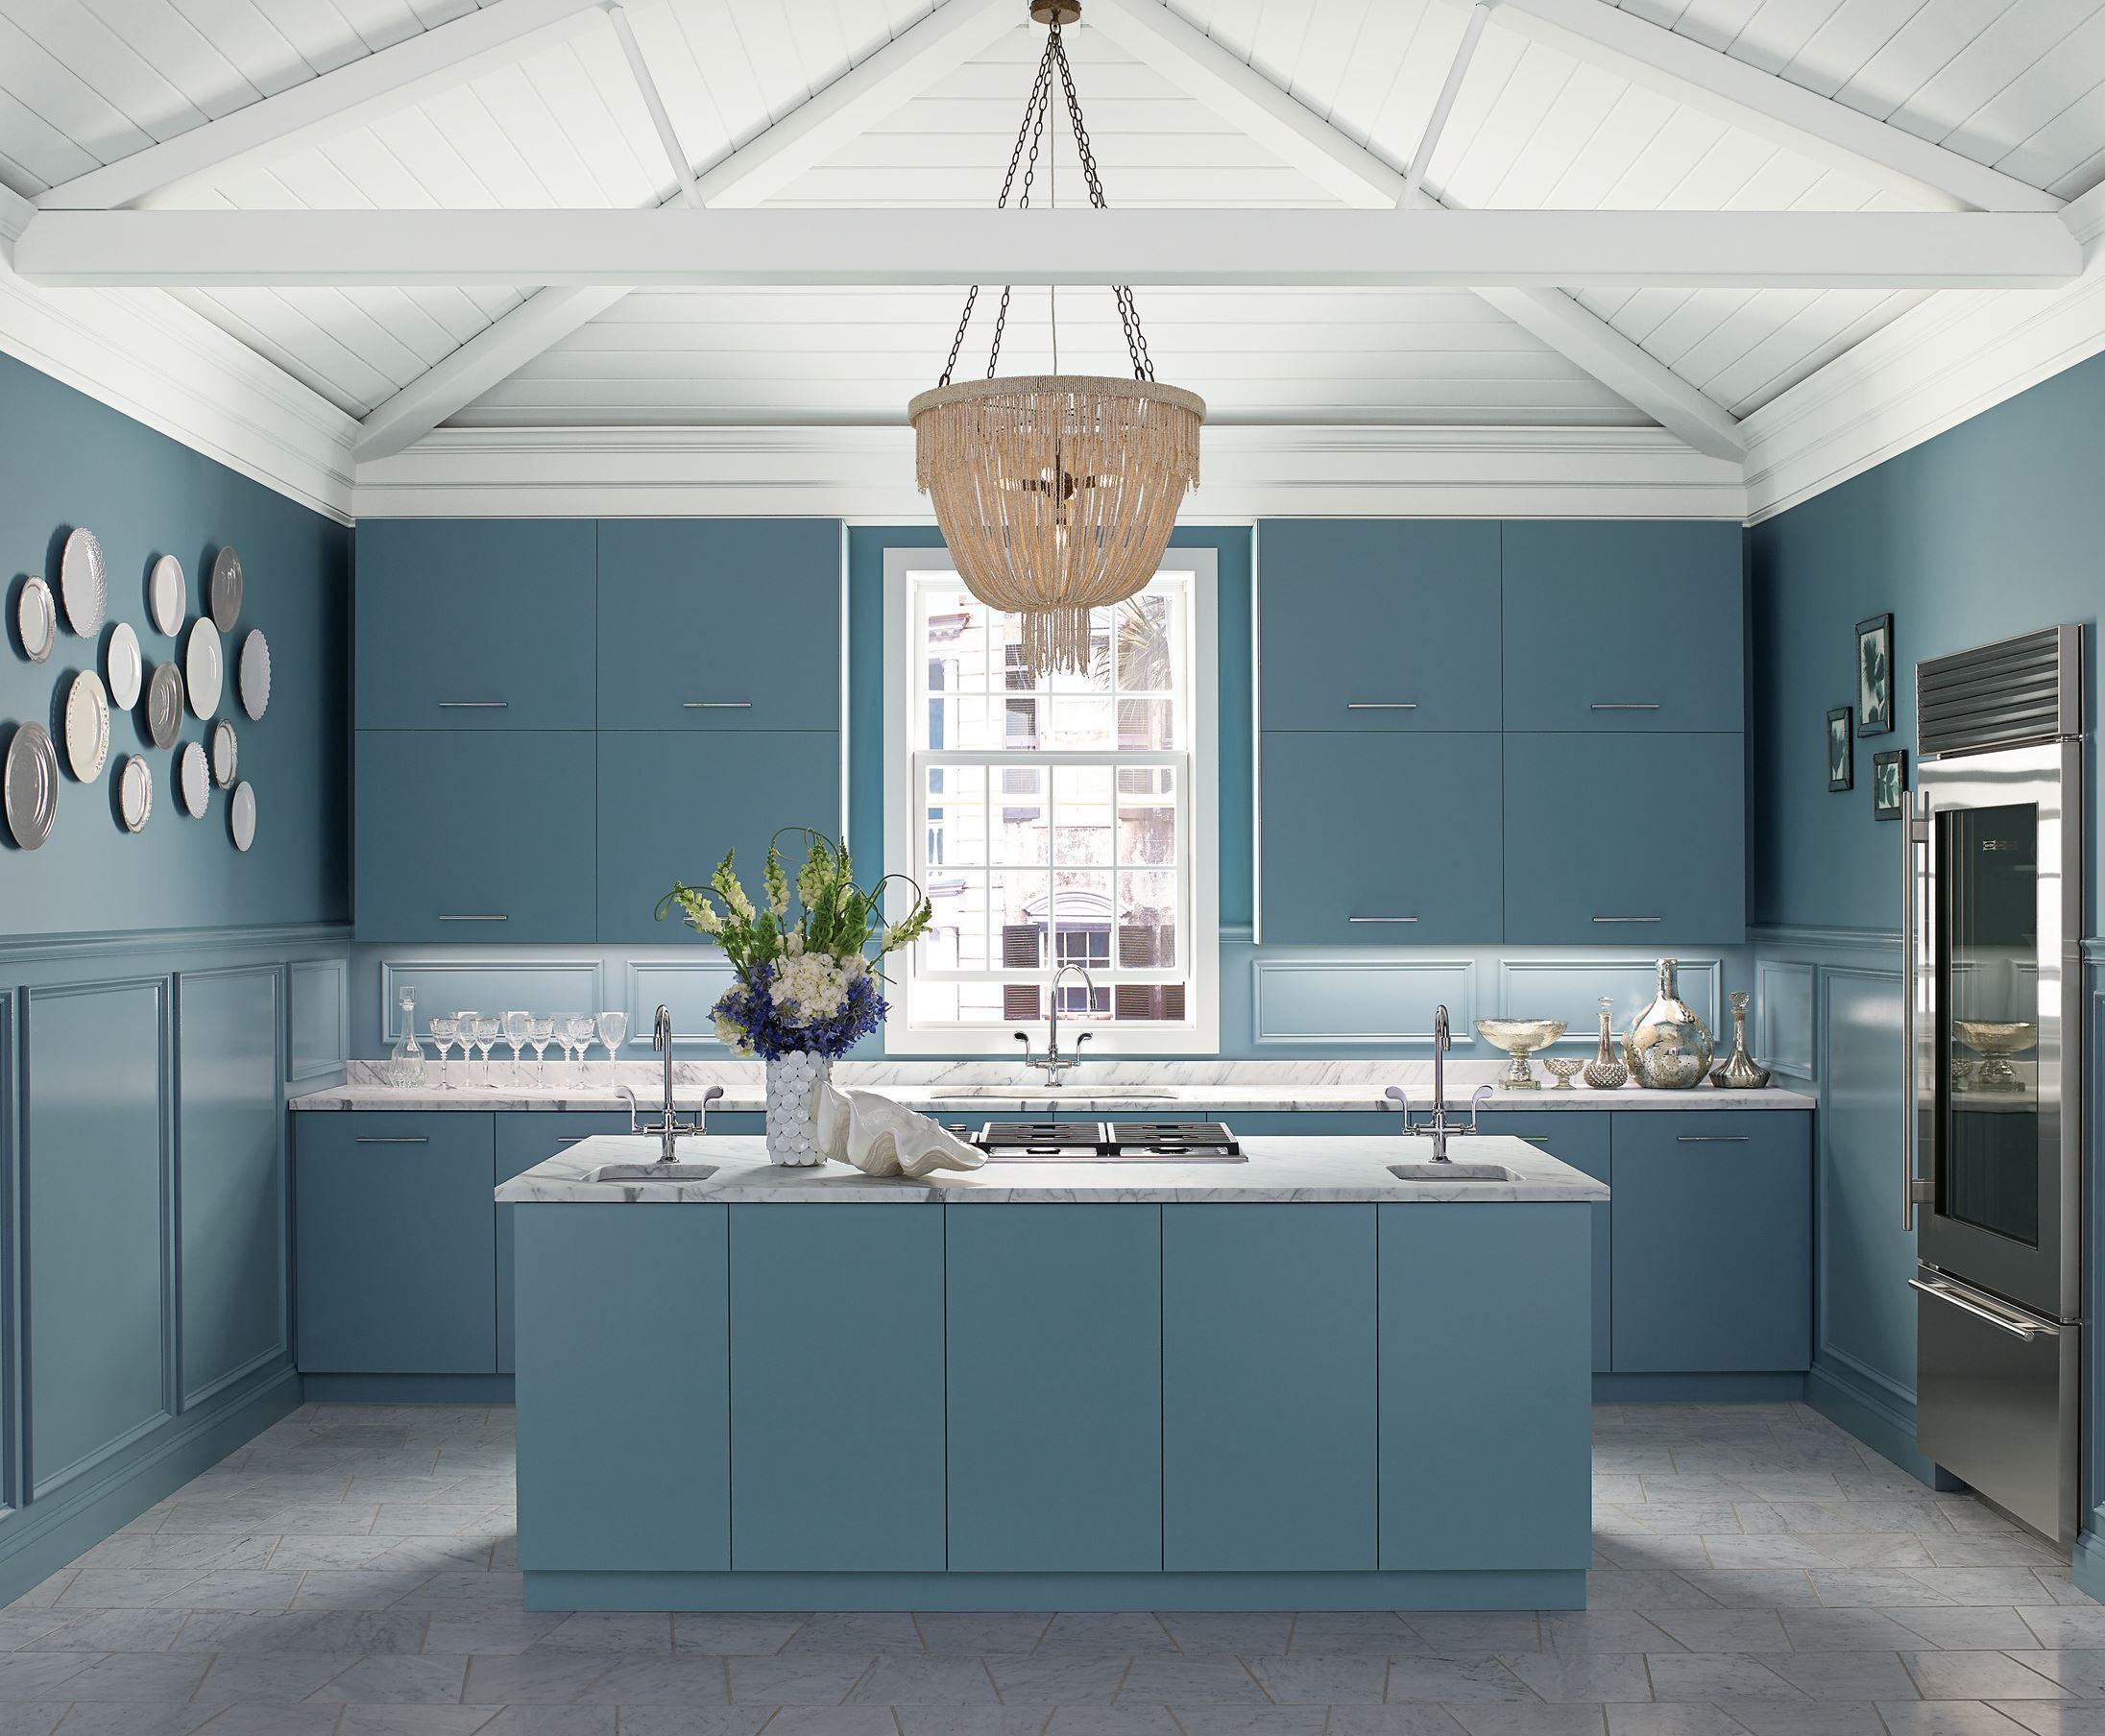 La cuisine bleue avec un lustre massif deviendra le principal